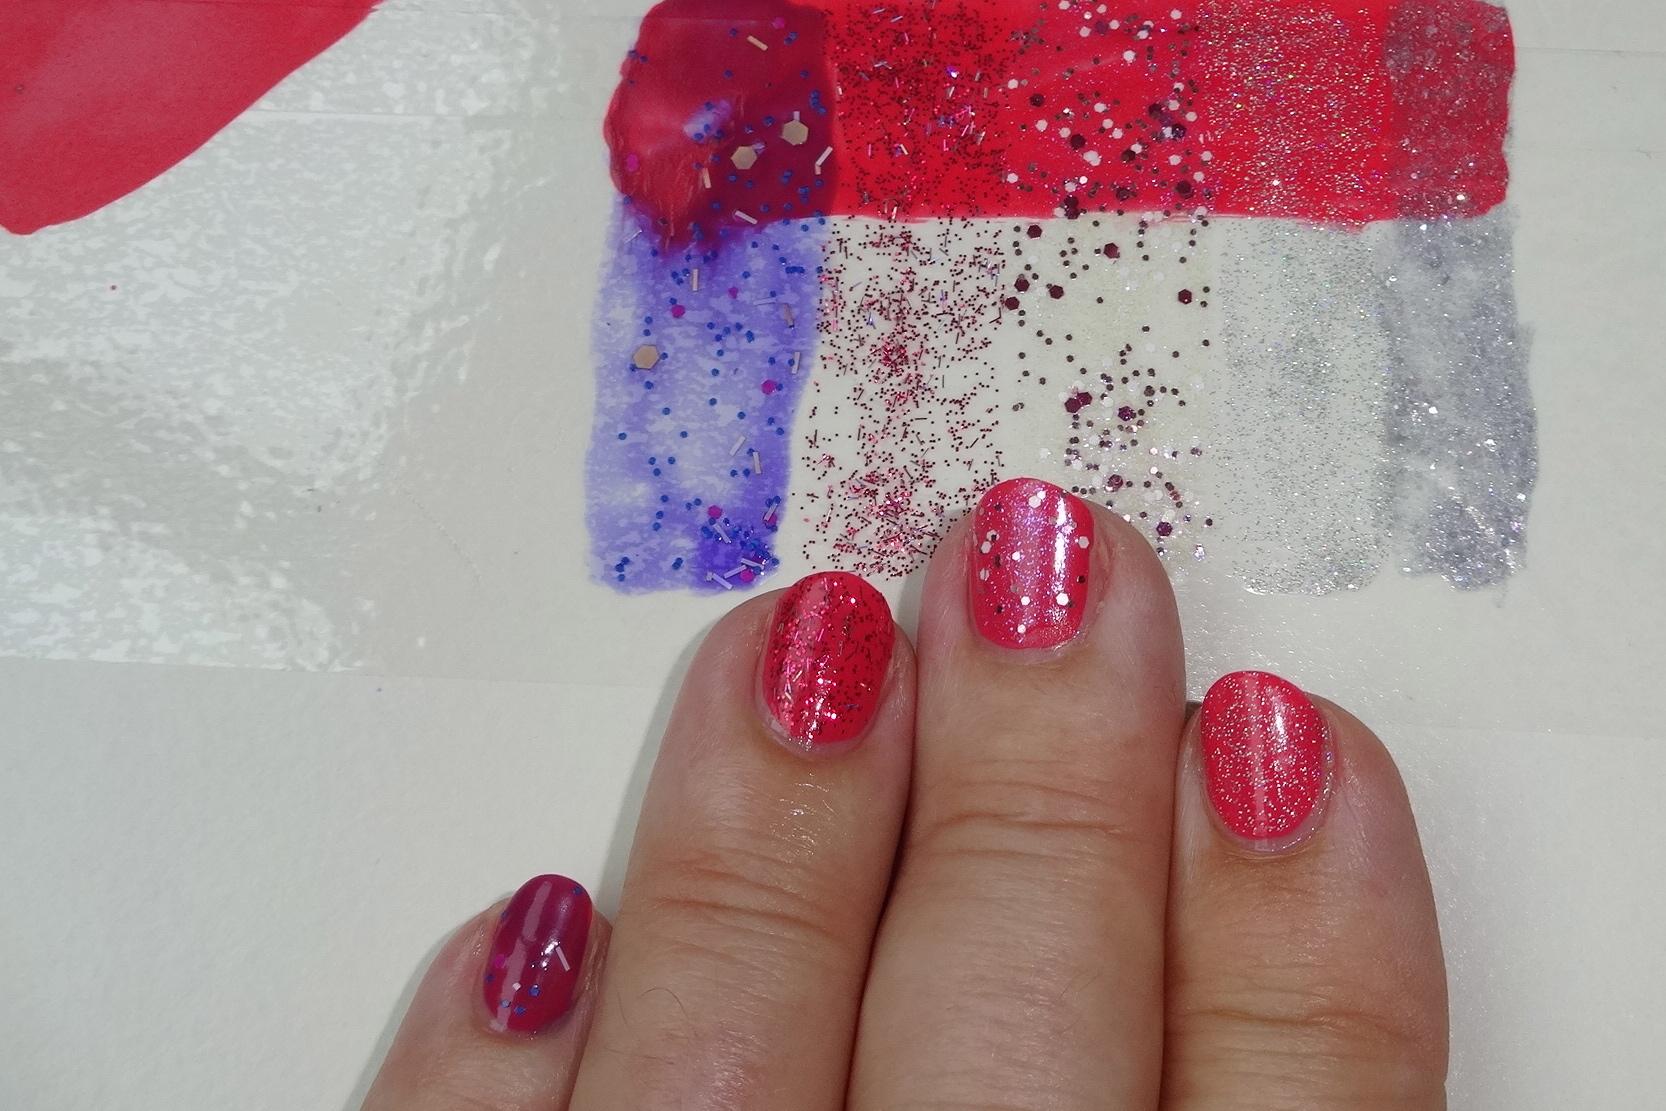 toppers on my nails / effect Lacke auf meinen Nägeln